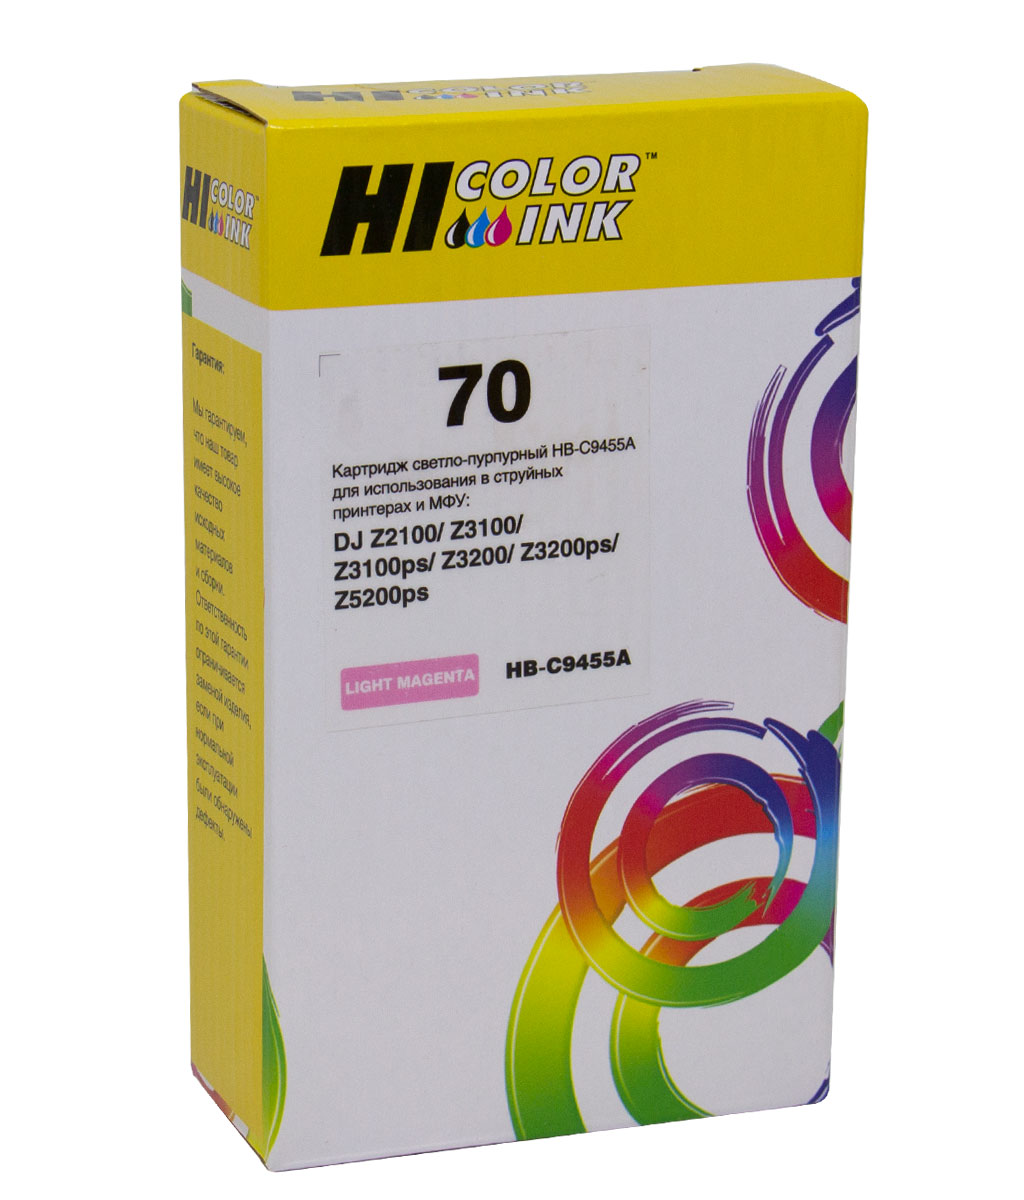 Картридж Hi-Black (HB-C9455A) №70 для HP DesignJet z2100/3100/3200/5200, LM